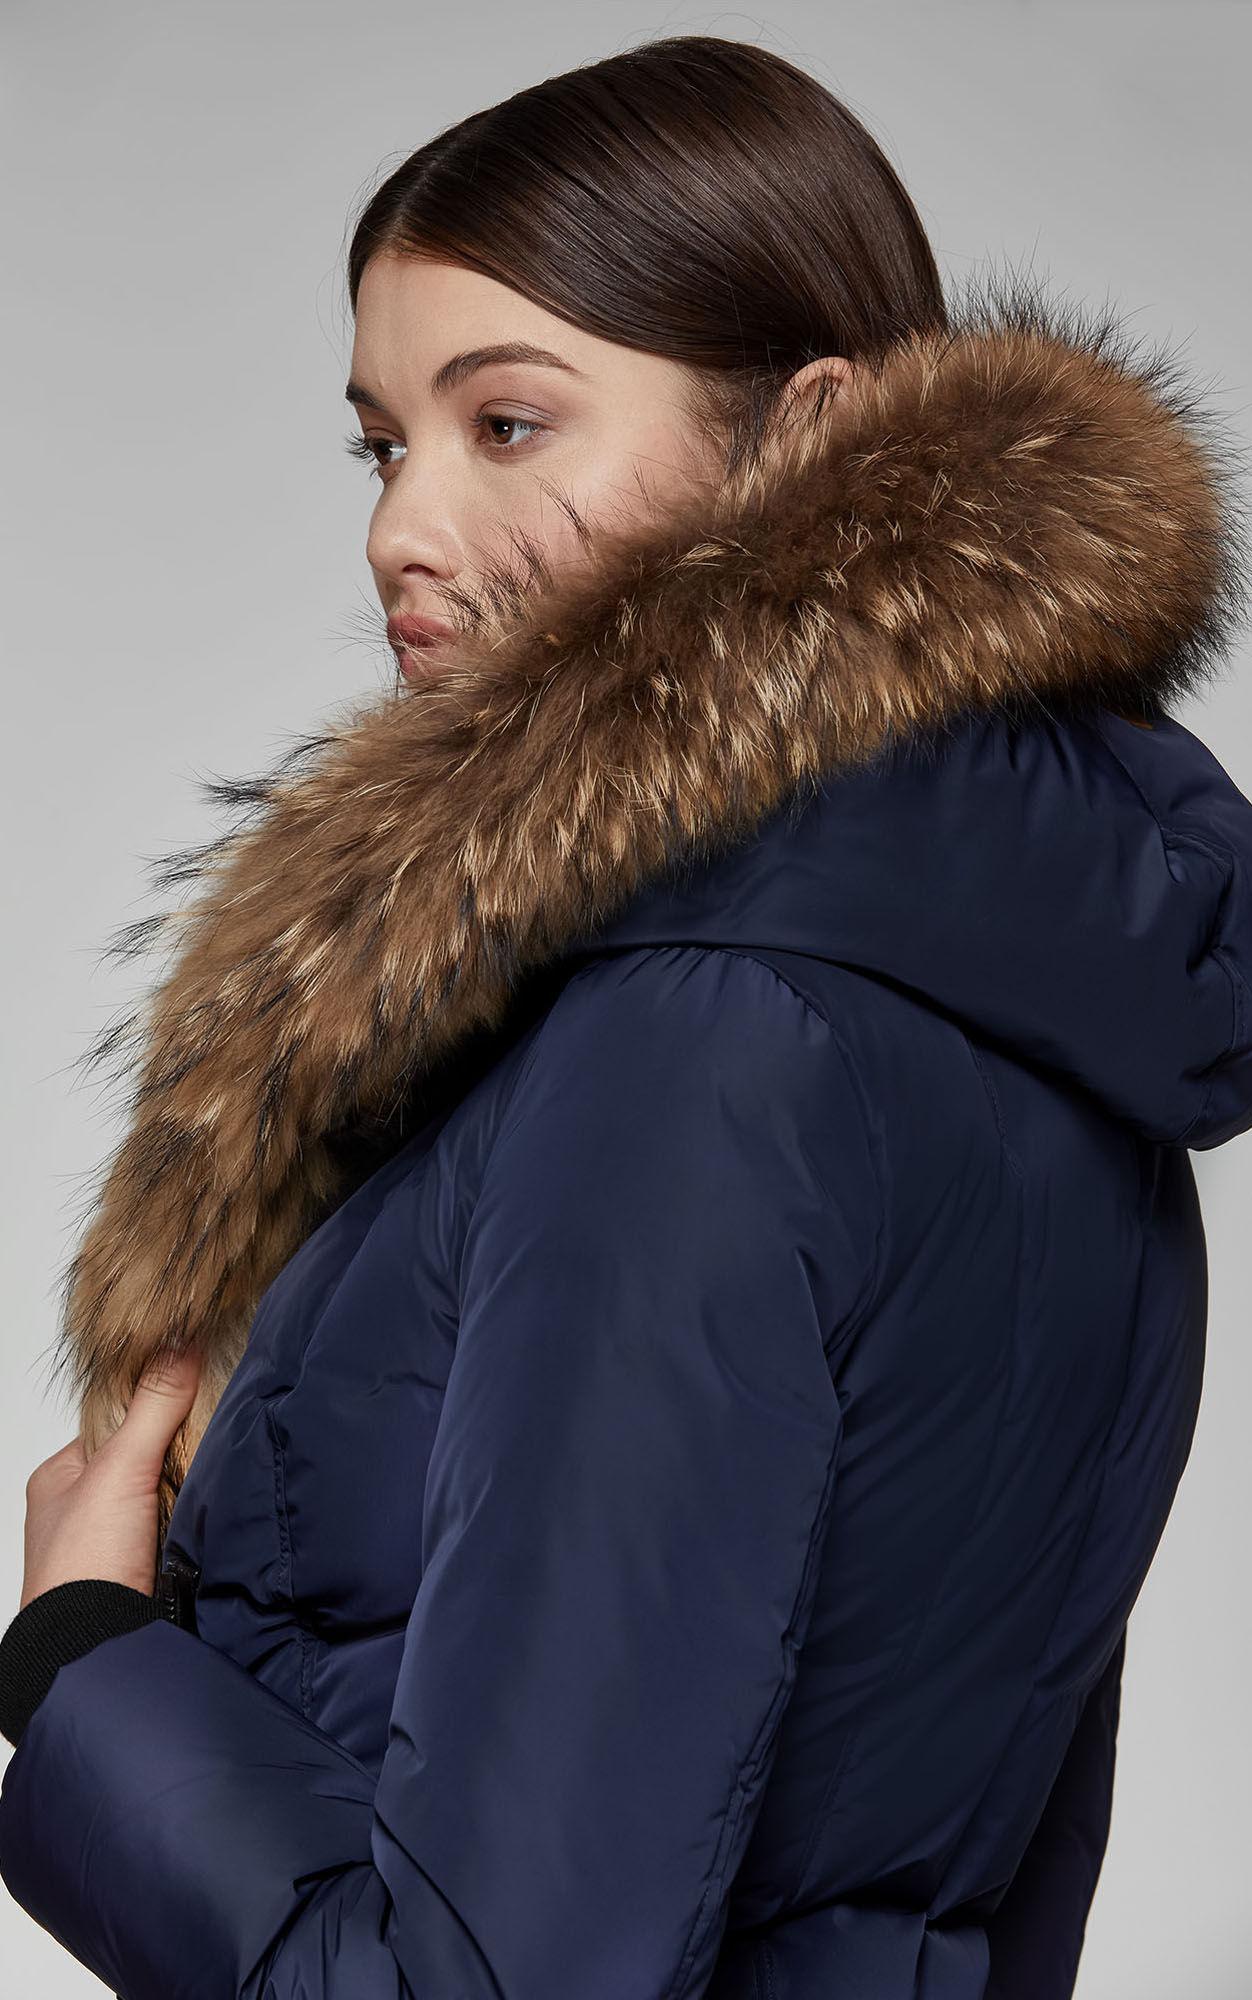 b2cf7cd378d0 ... Adali Fitted Winter Down Coat With Hood And Fur Trim Szl160 Ink -. View  fullscreen